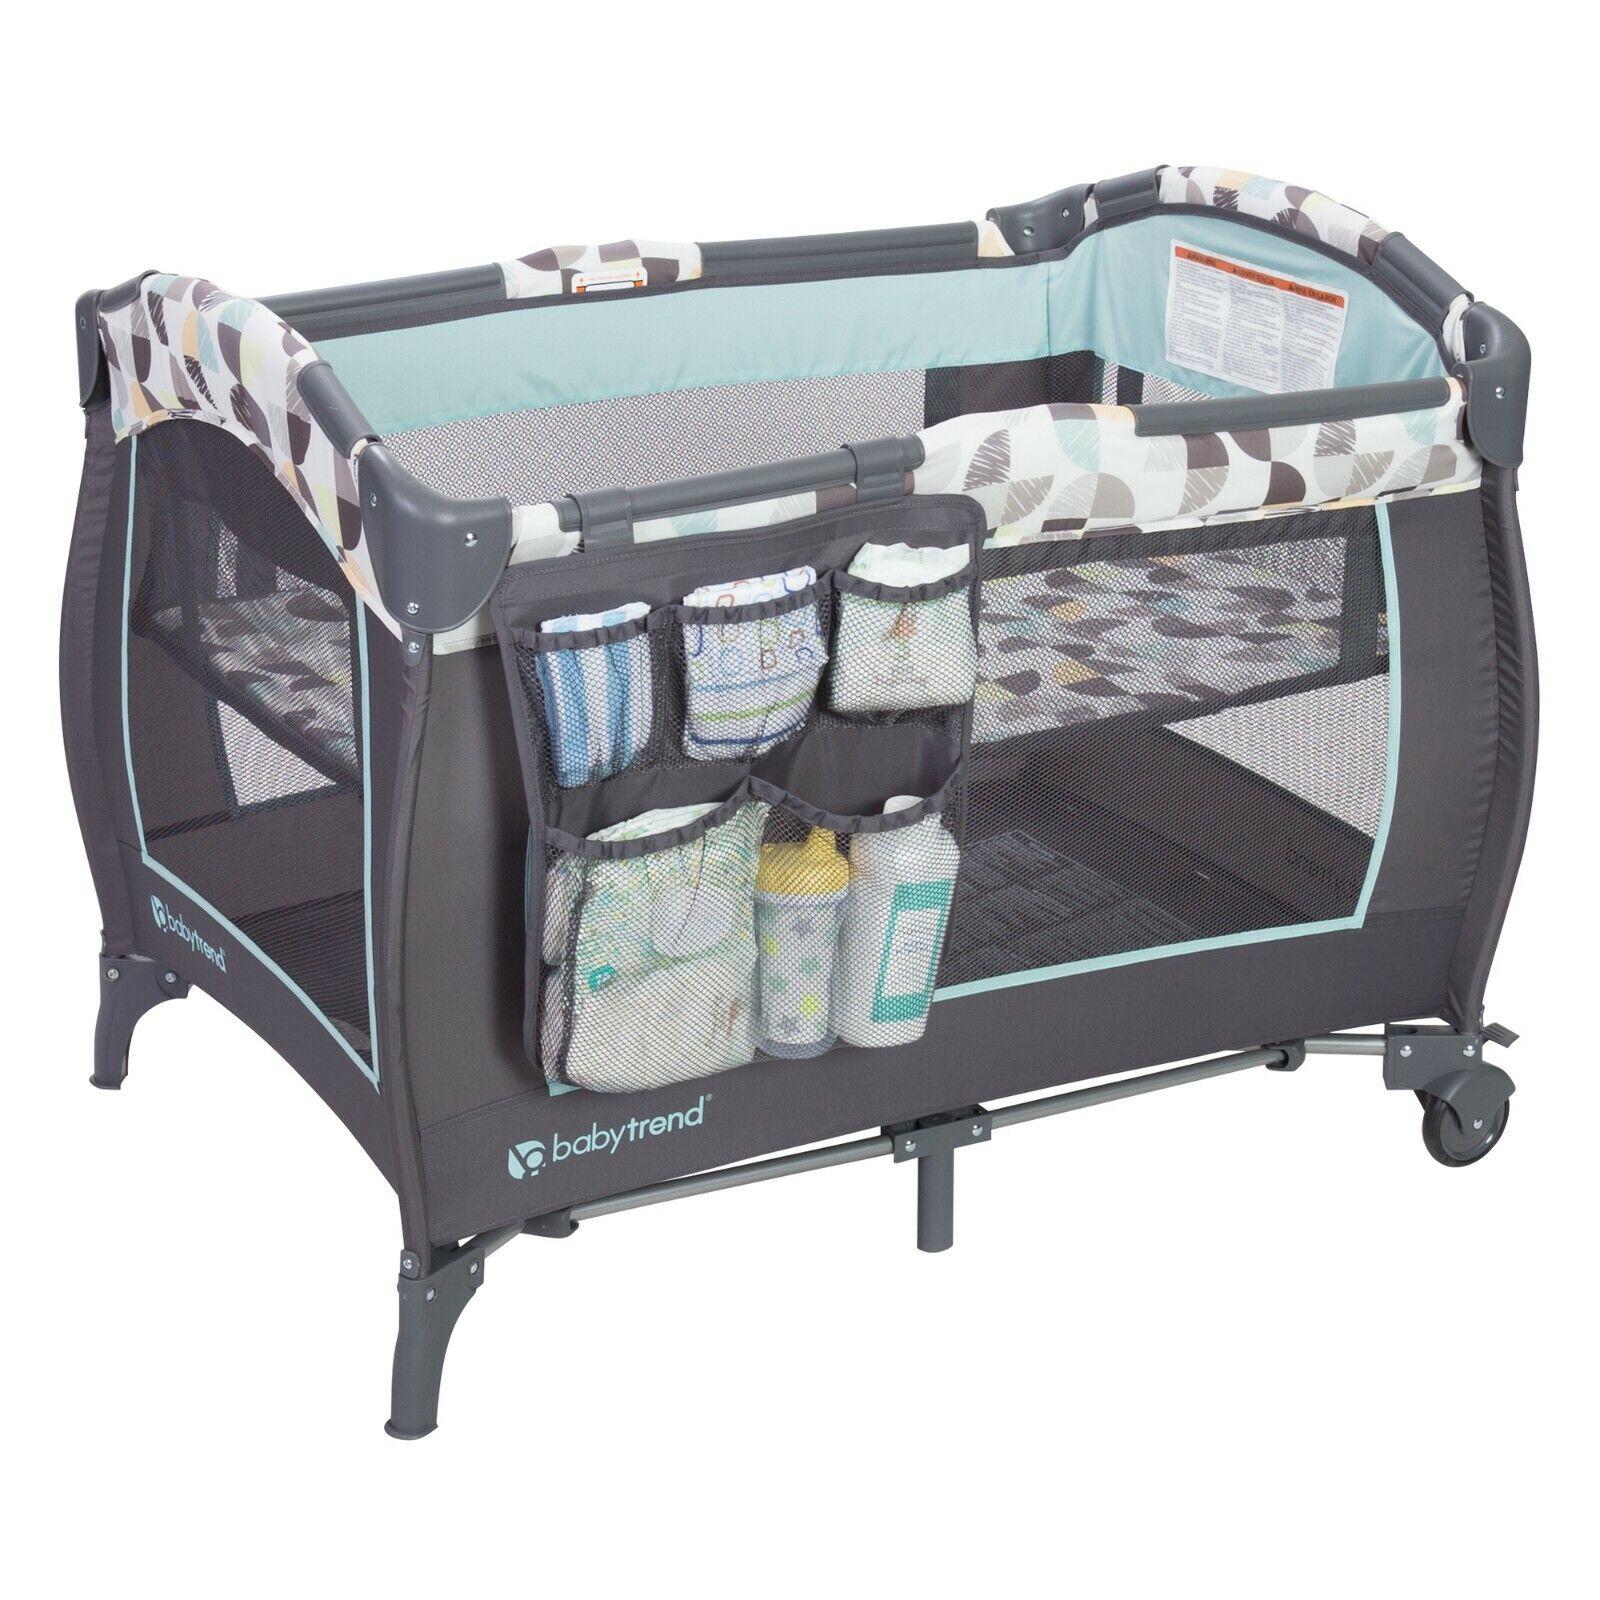 trend nursery center playard bassinet playpen sleeper